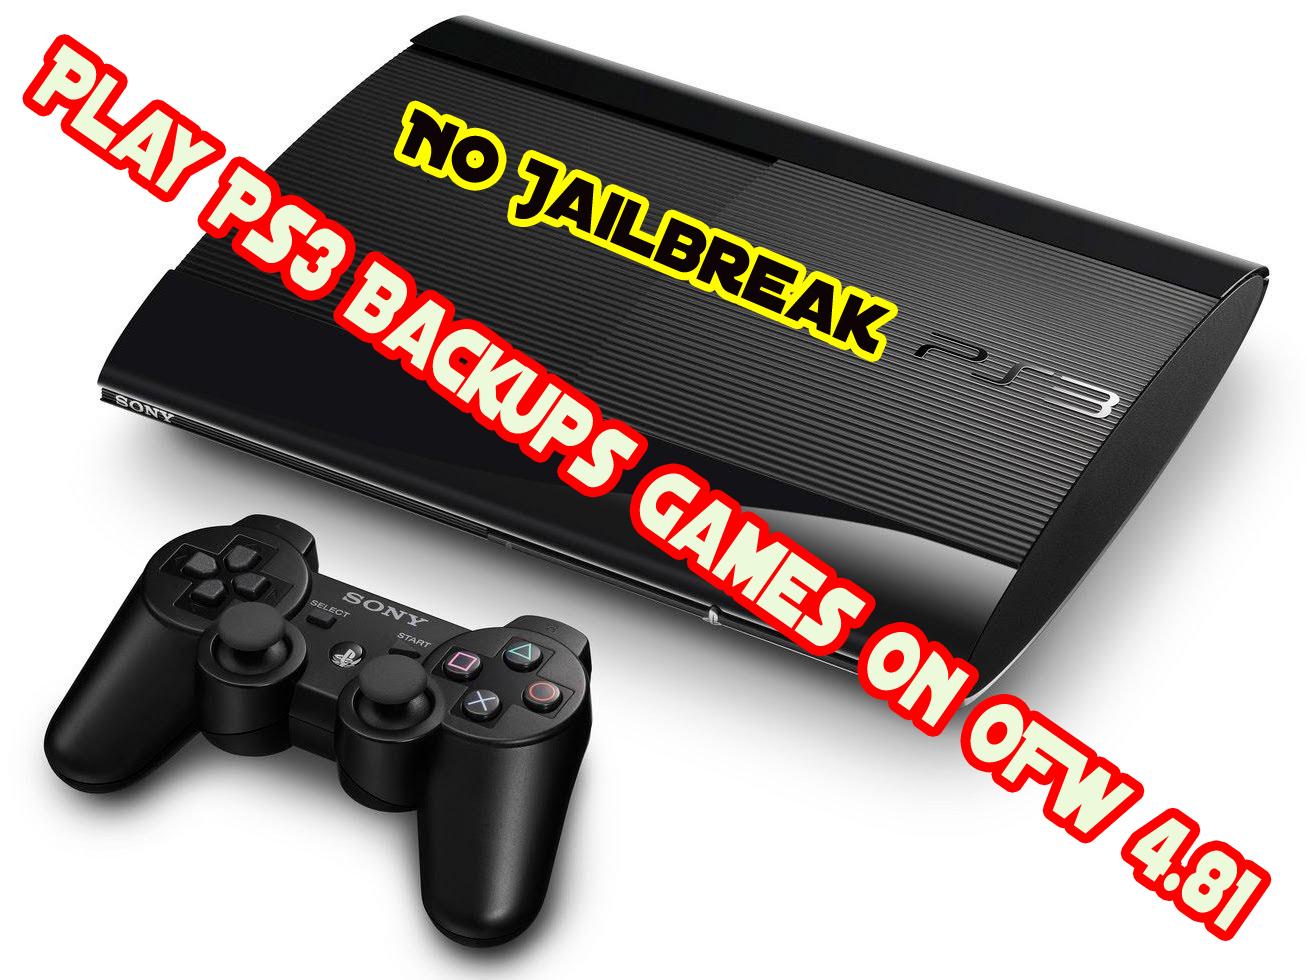 🏆 Where to download ps3 games for jailbreak | PS3 Jailbreak